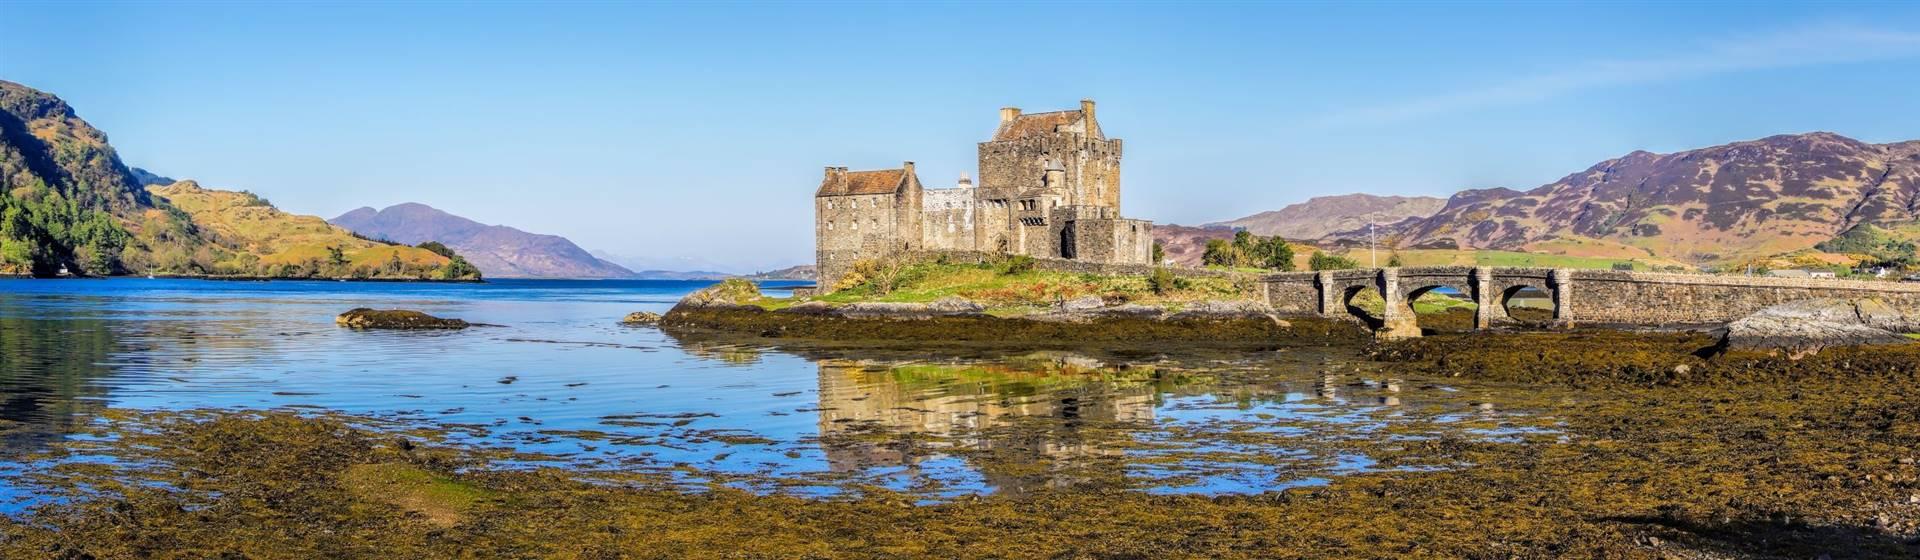 "<img src=""eileandonancastle-shutterstock.jpeg"" alt=""Eilean Donan Castle - Scotland""/>"